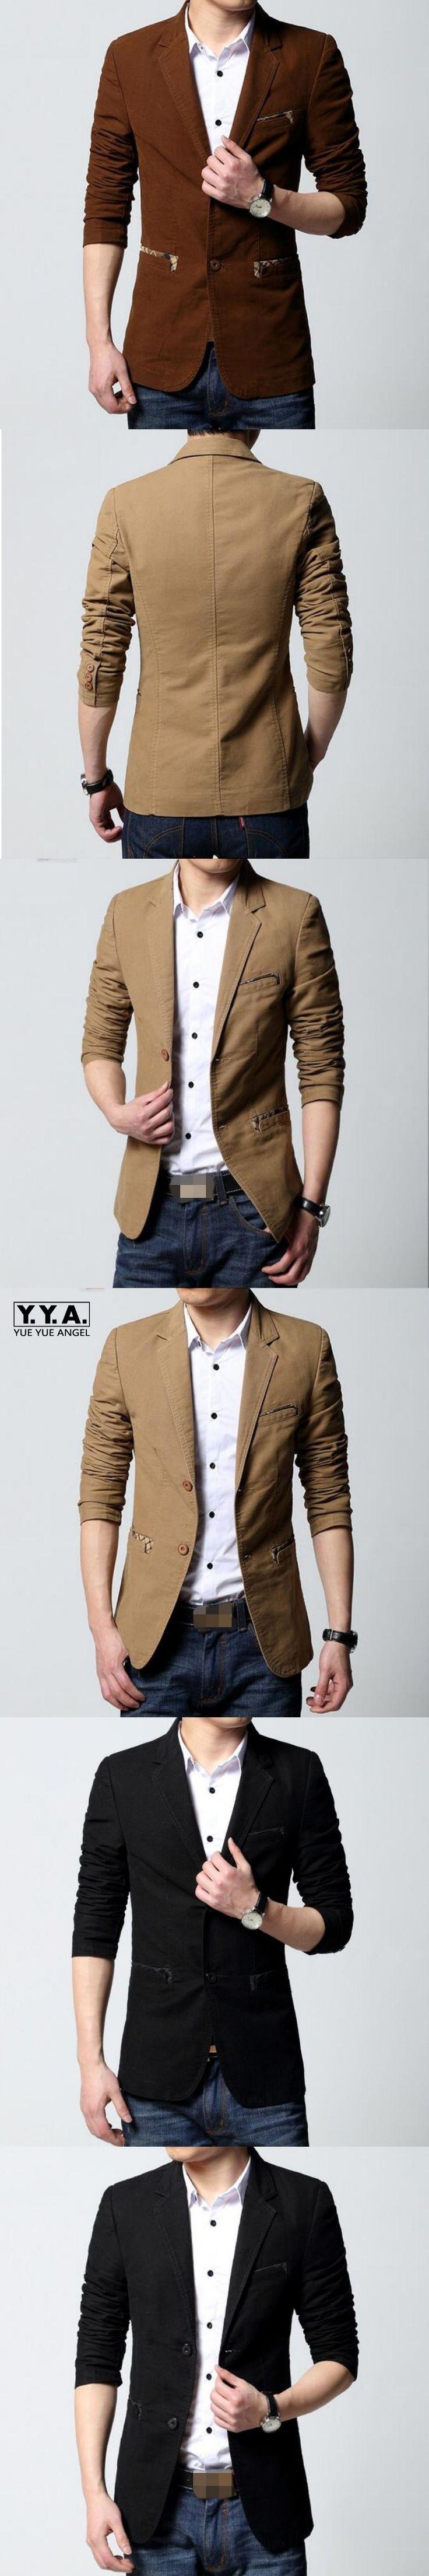 Autumn High Quality 100% Cotton Fashion Men Slim Fit Two Button Casual Coat Suit Blazer Outwear School Jacket For Man Male 6XL